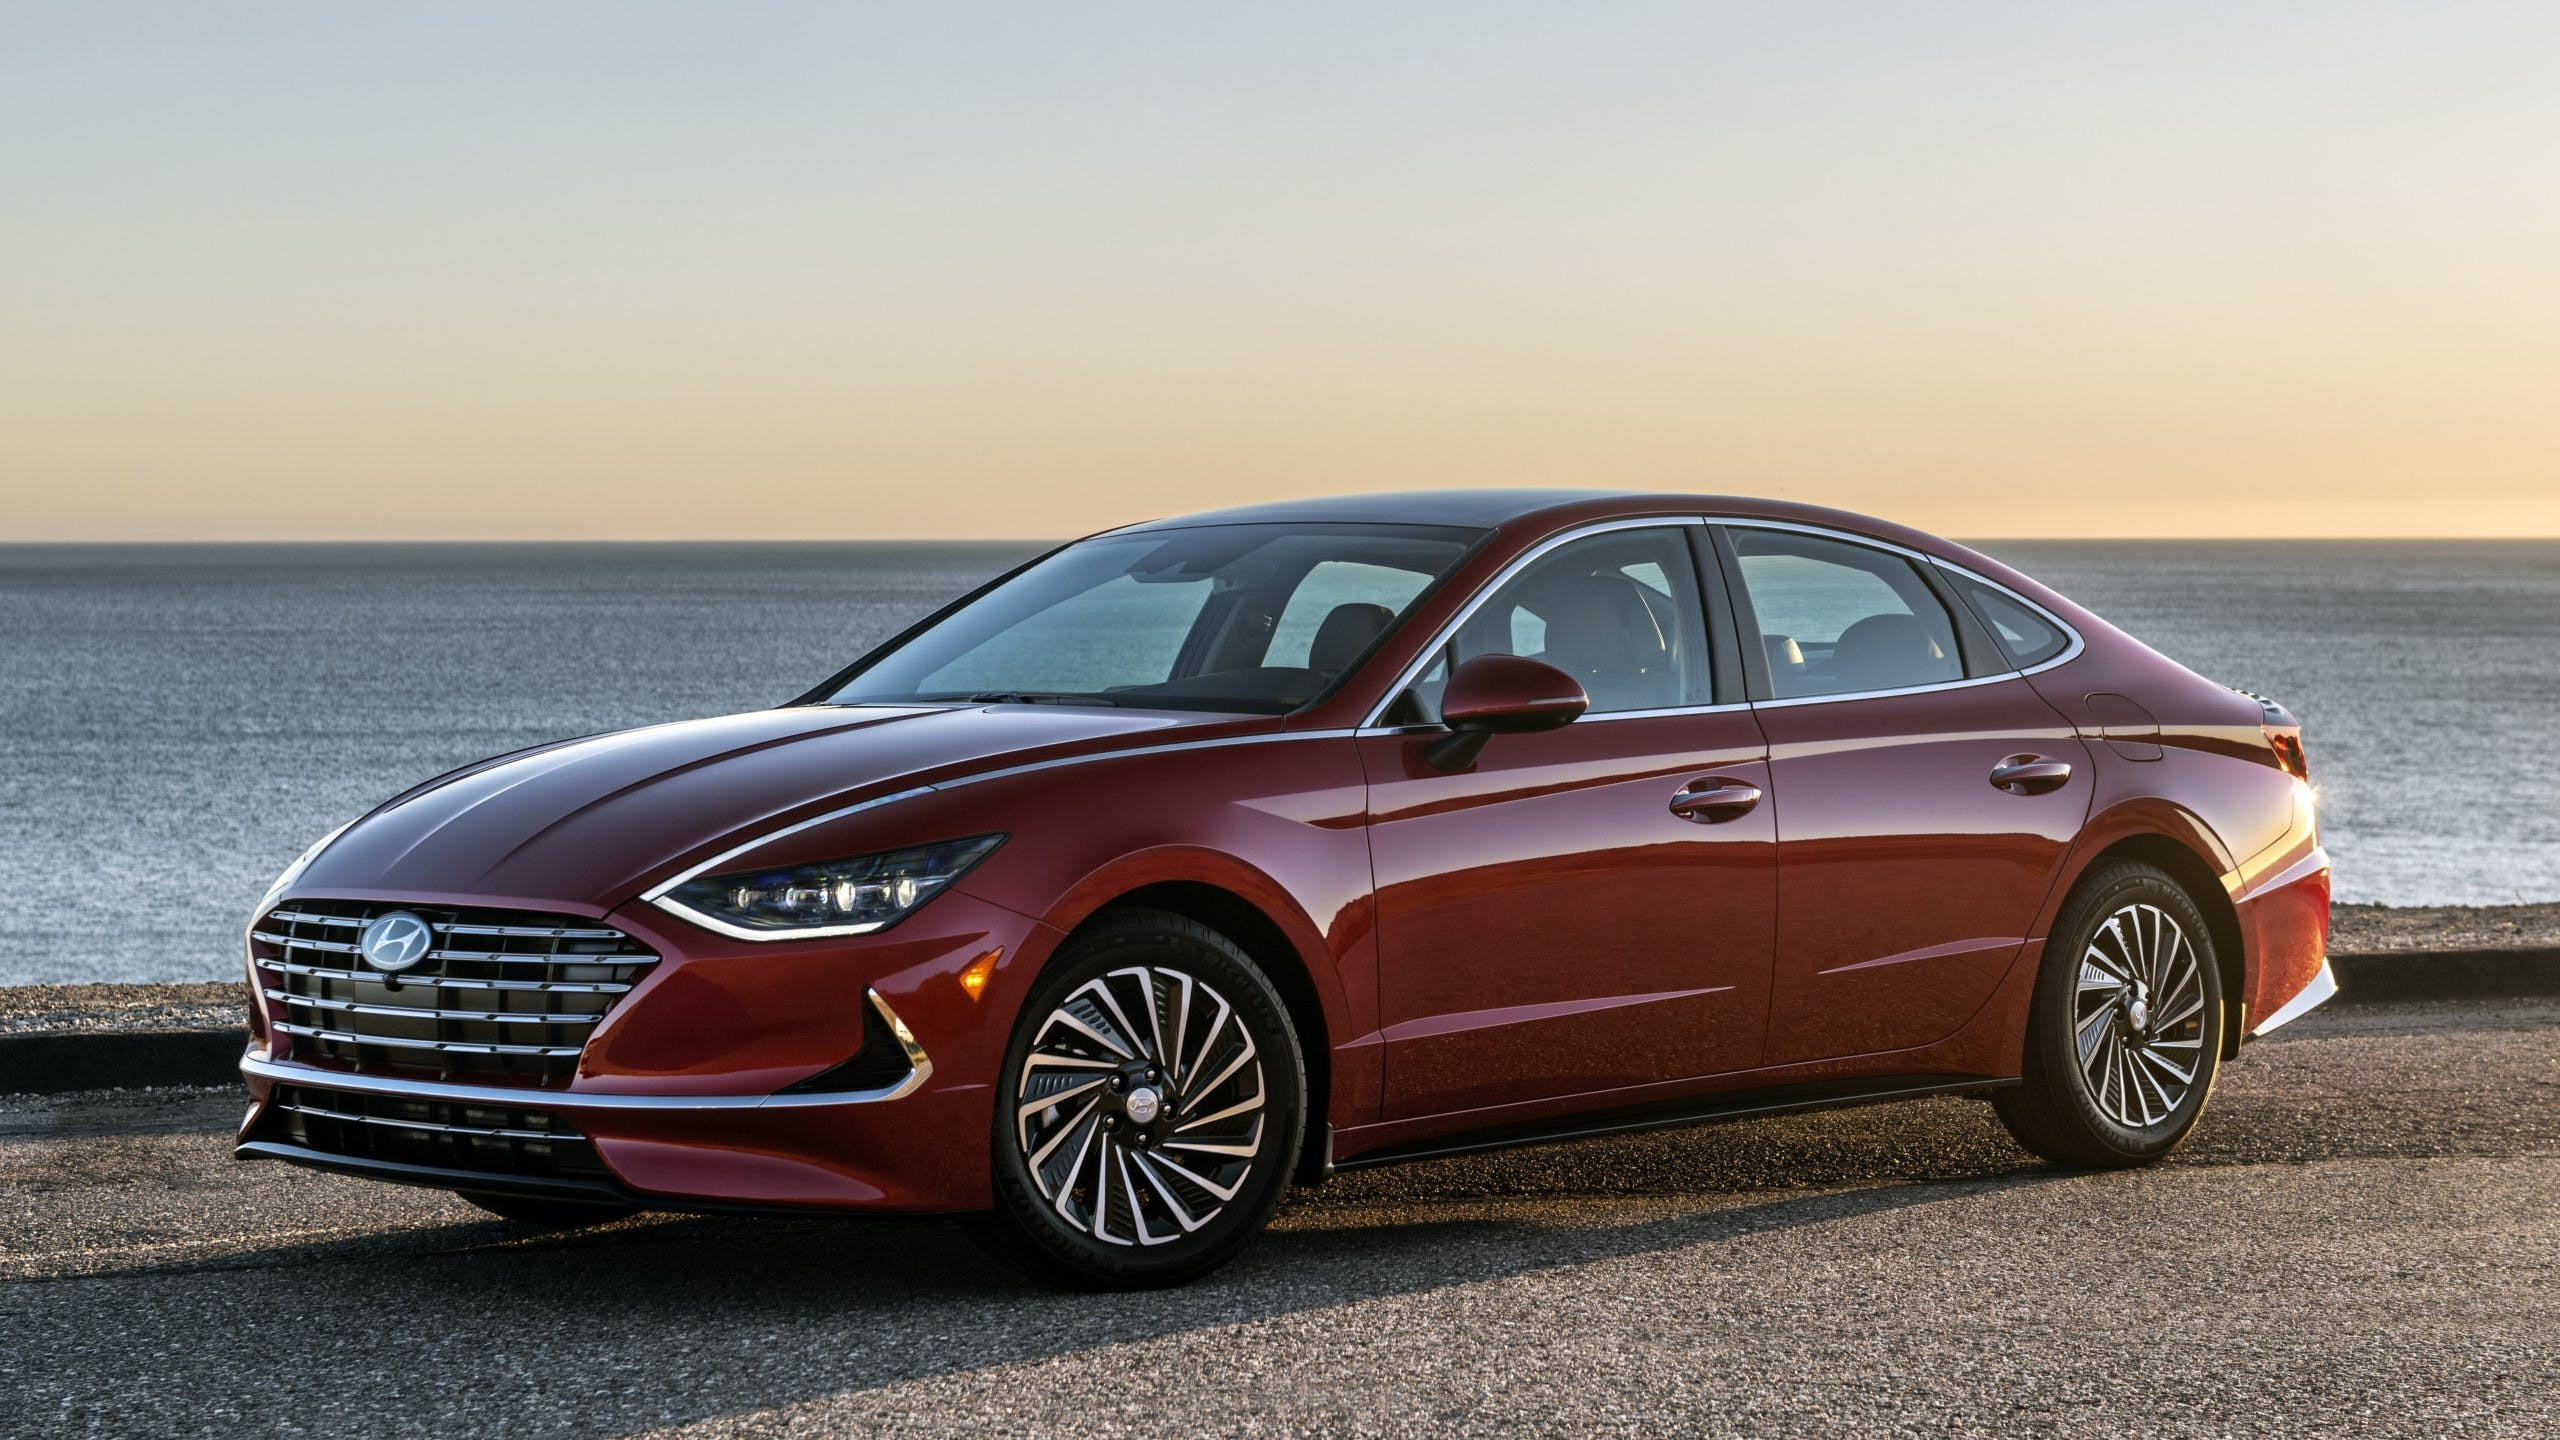 redesigned 2020 hyundai sonata hybrid | test drive review